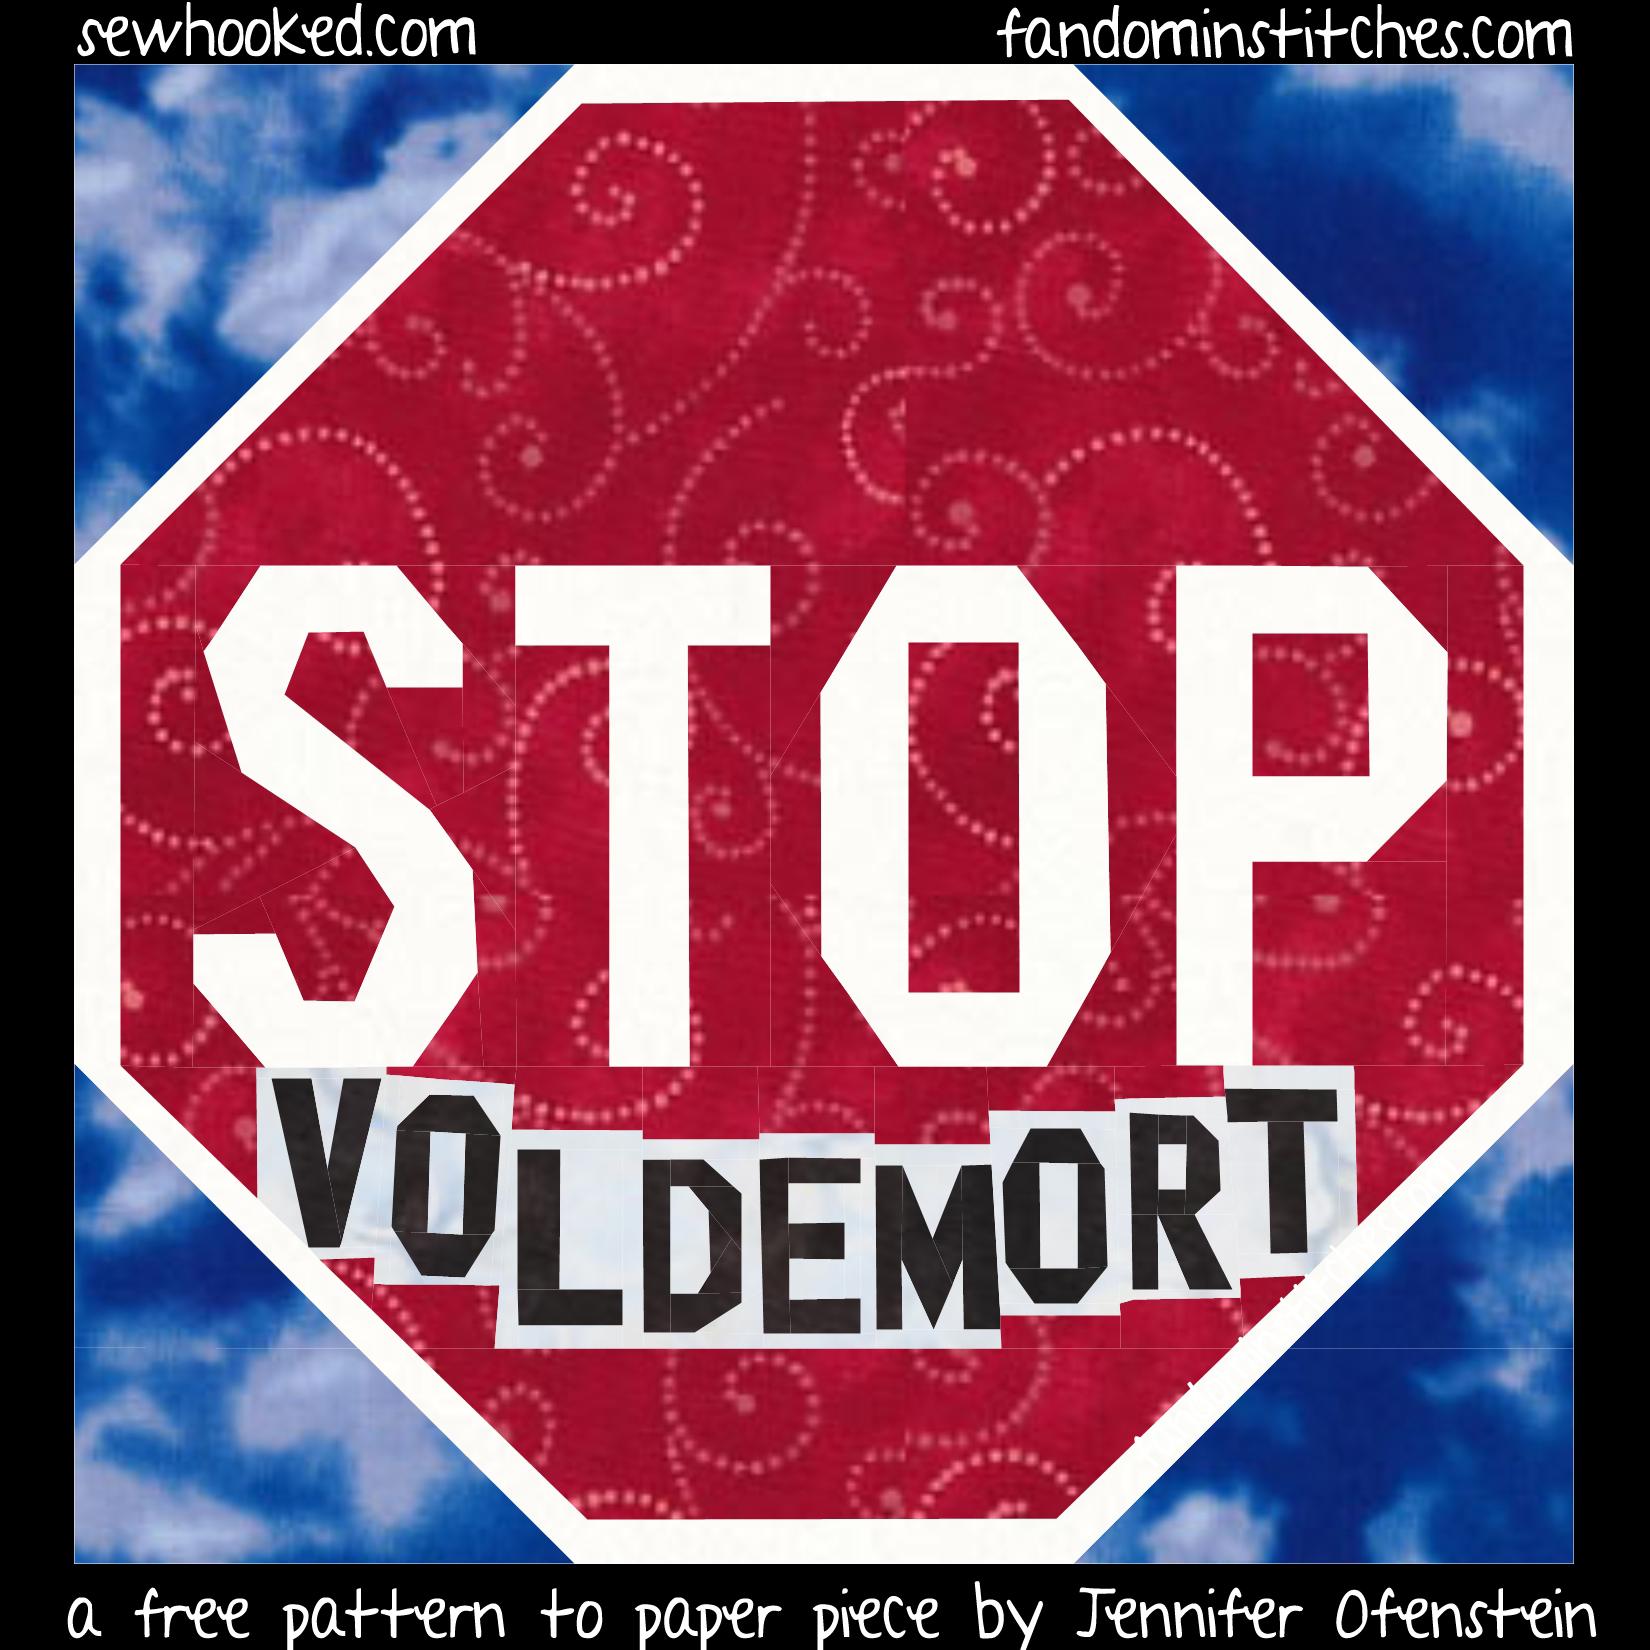 Stop Voldemort FABRIC